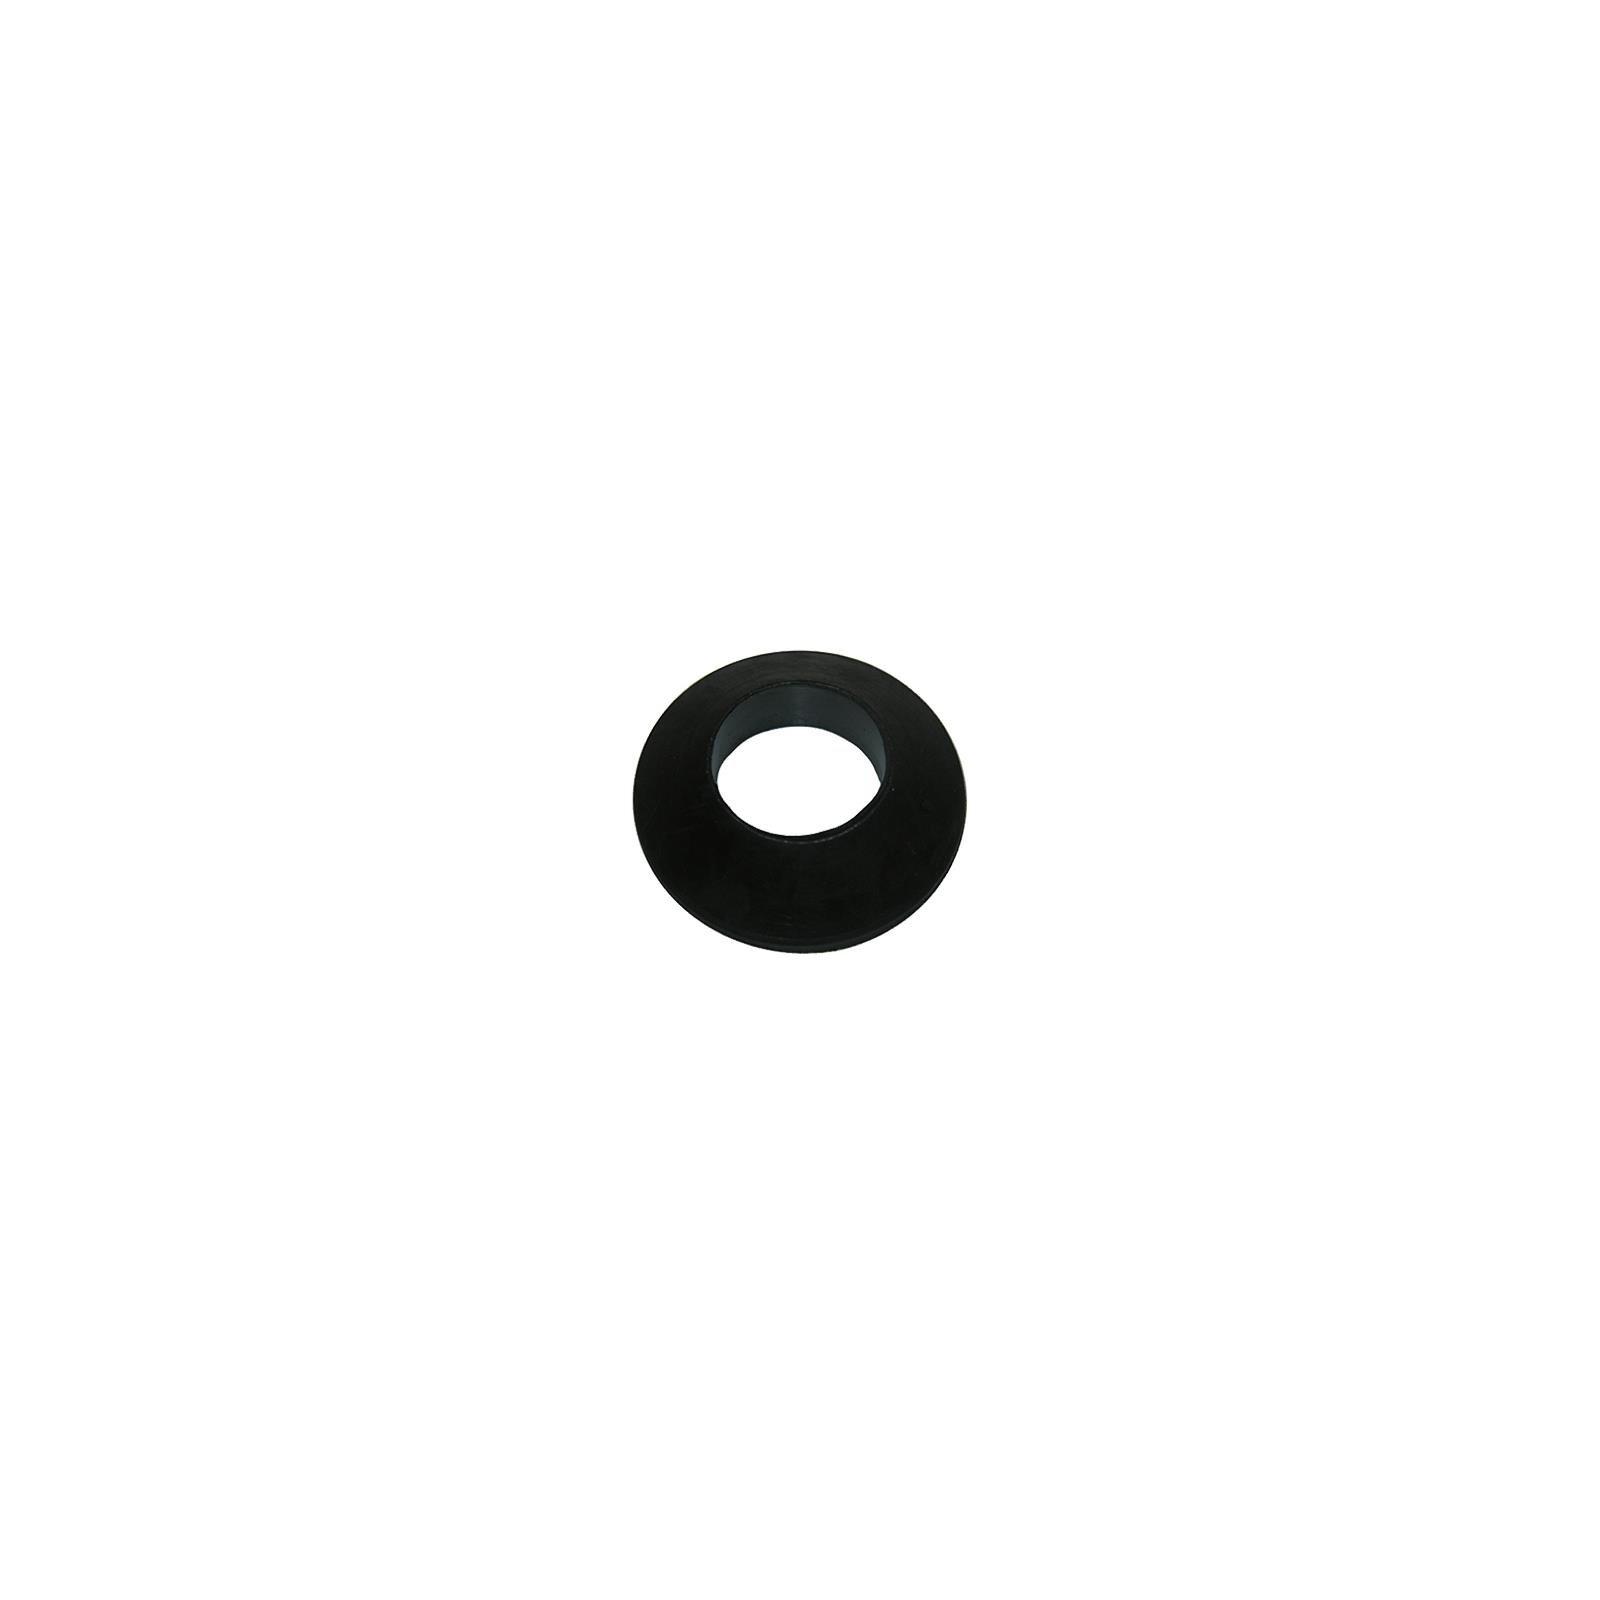 Larsen Supply 02-2881 Rubber Ballcock Shank Seal,Beveled - Quantity 6